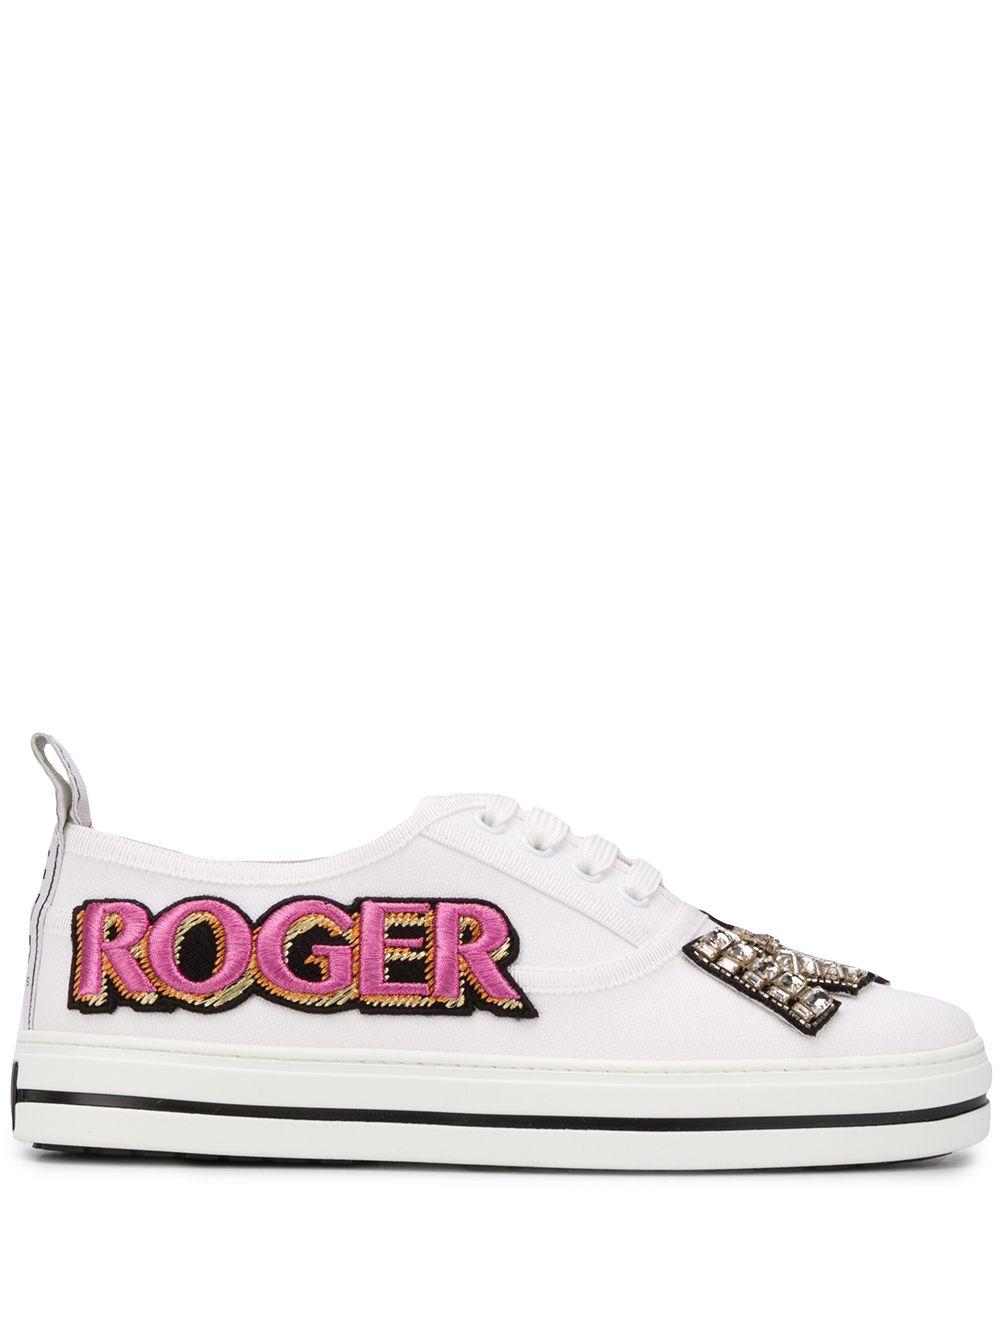 Call Me Vivier Sneakers